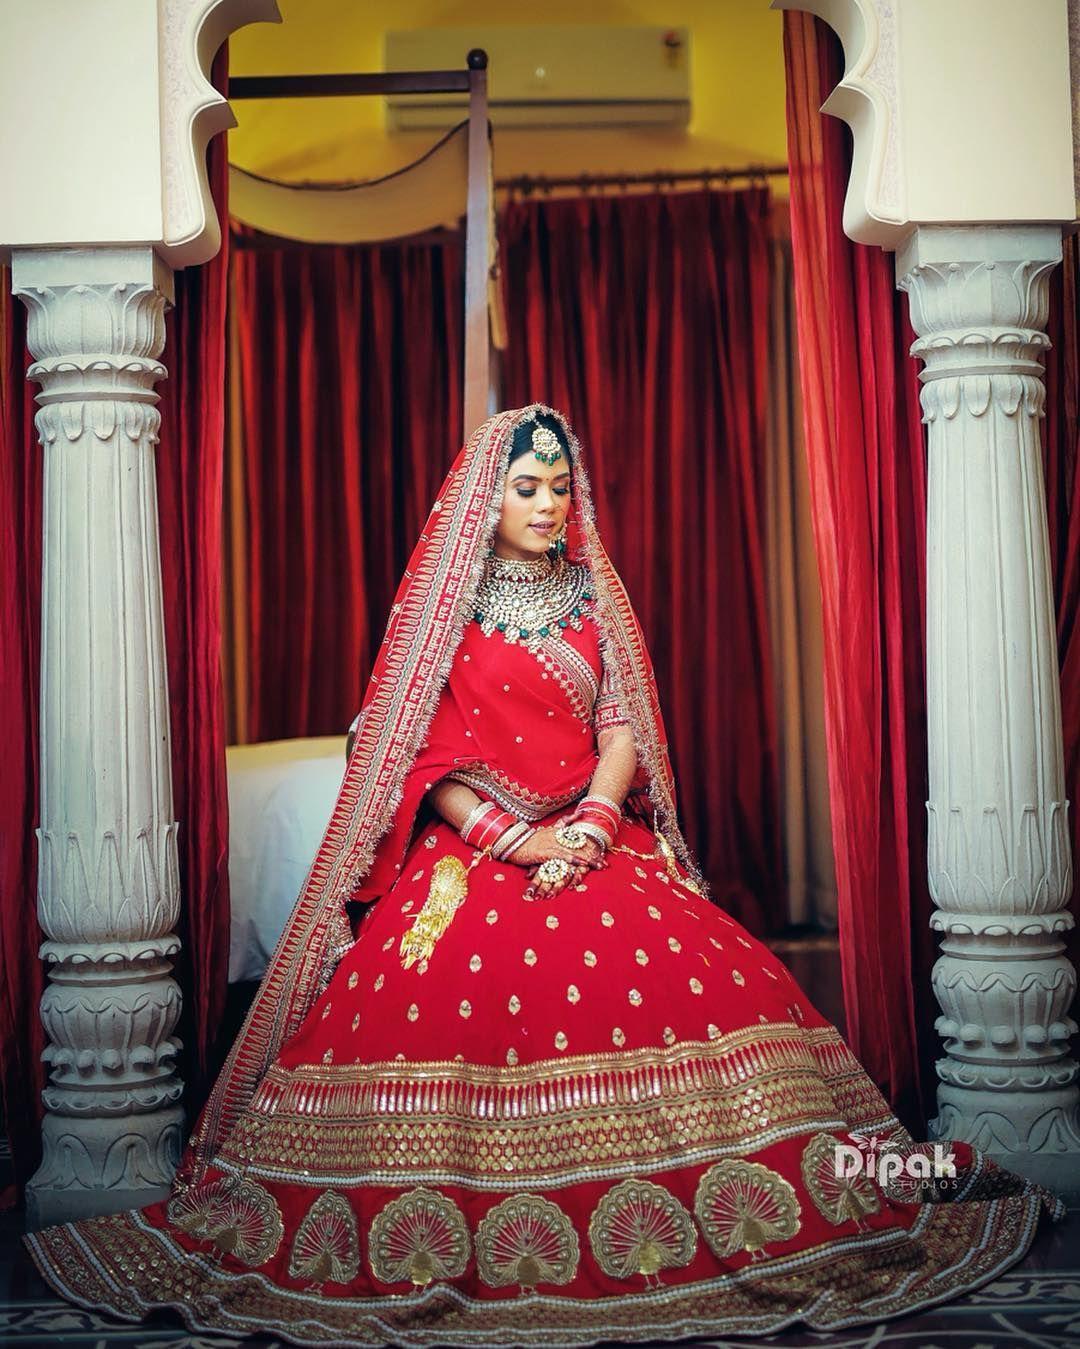 The Real Anushka Sharma Deepika Padukone Lehenga Cost Frugal2fab Red Bridal Lehenga Sabyasachi Bridal Lehenga Red Red Wedding Lehenga